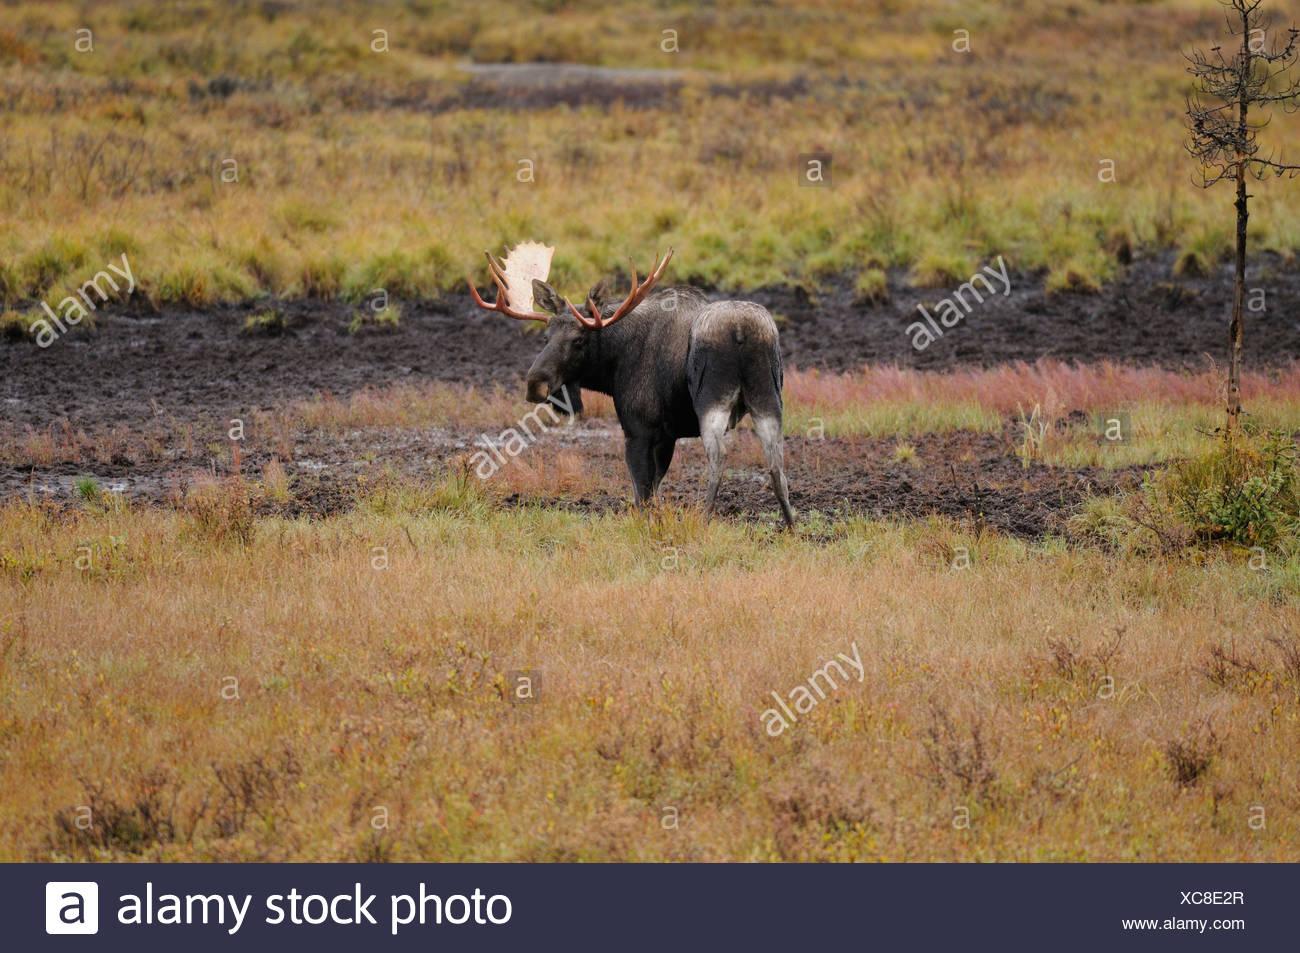 Moose, Alces alces, Cervidae familiy, bulle, fall, fall colours, Peter Lougheed Province Park, Alberta, Canada - Stock Image